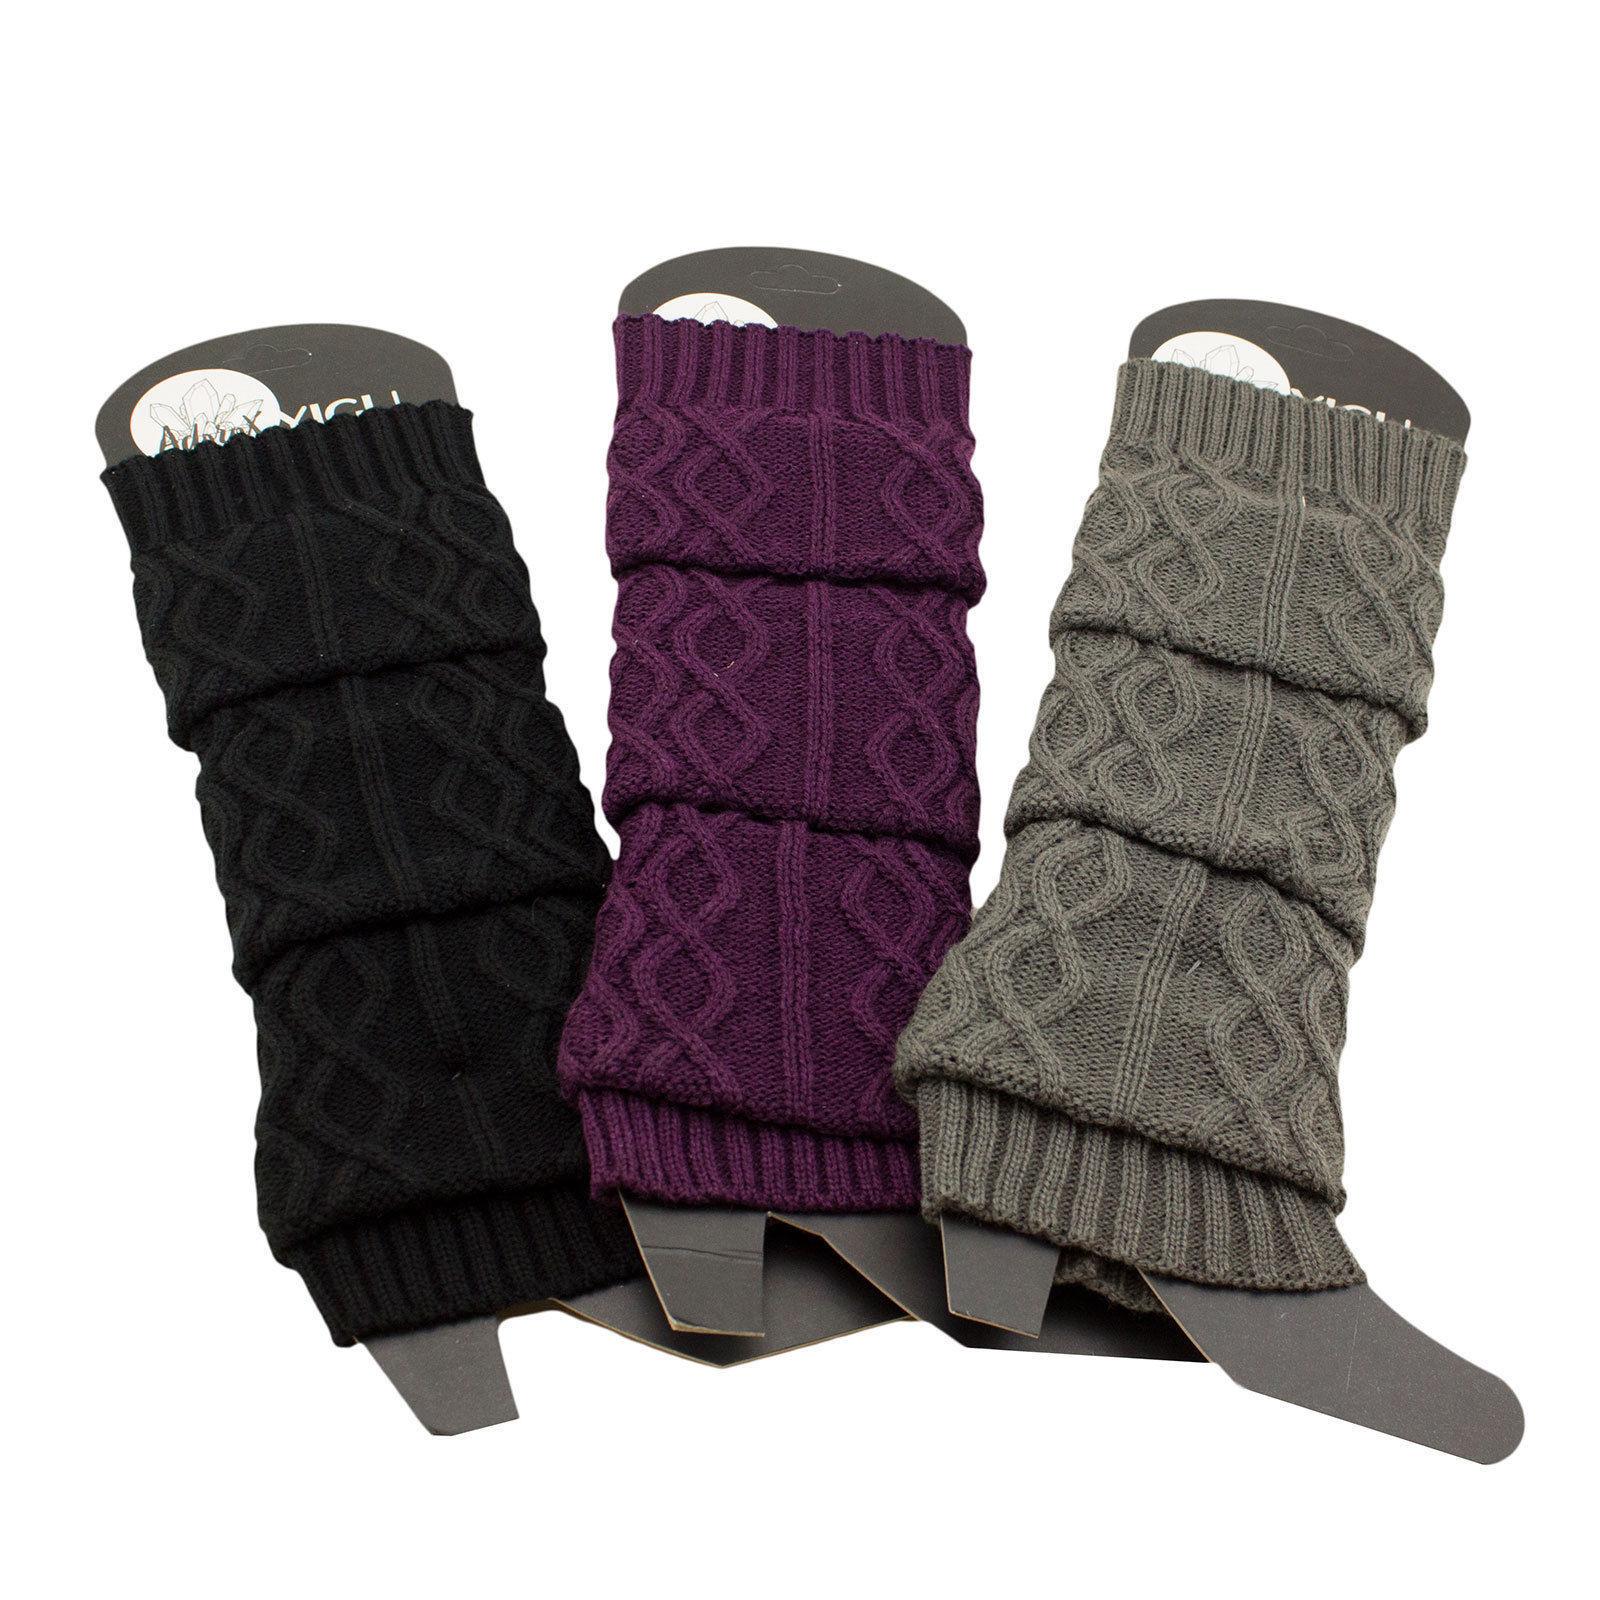 Women's Cable Knit Braided Leg Warmers Winter Boot Warmer Soft Knee Socks